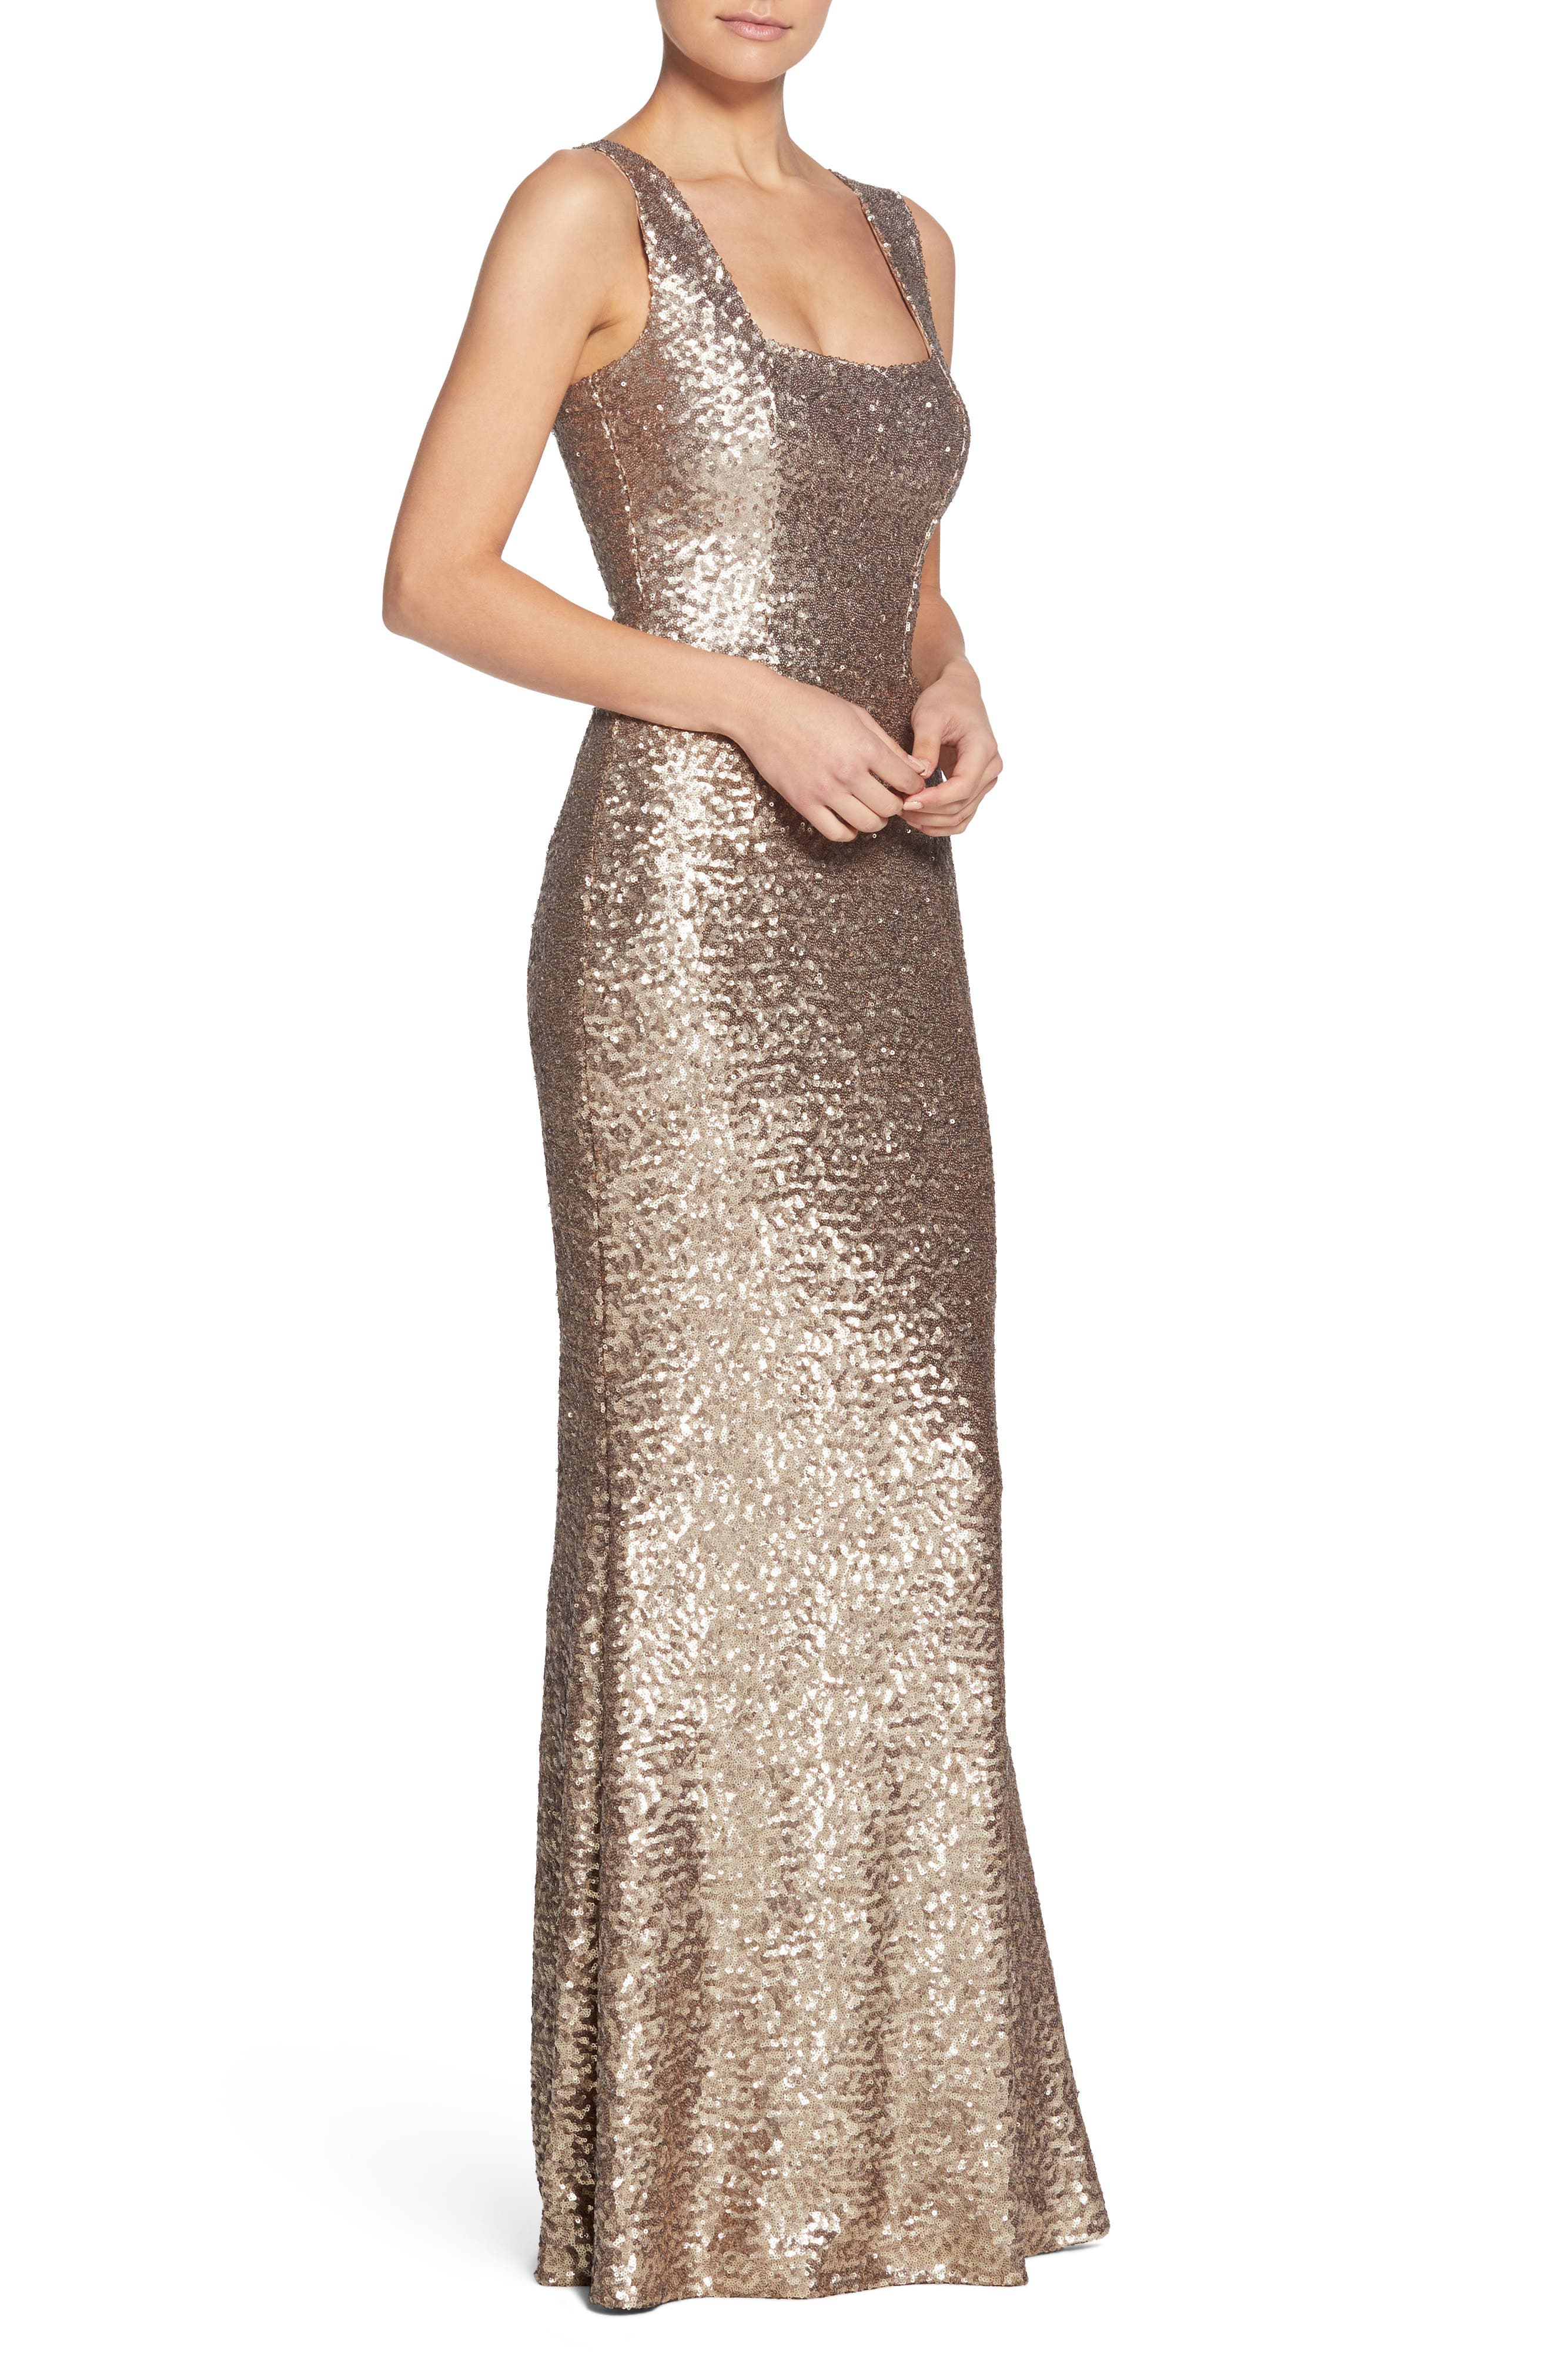 Raven Sequin Gown,                             Alternate thumbnail 3, color,                             Brass